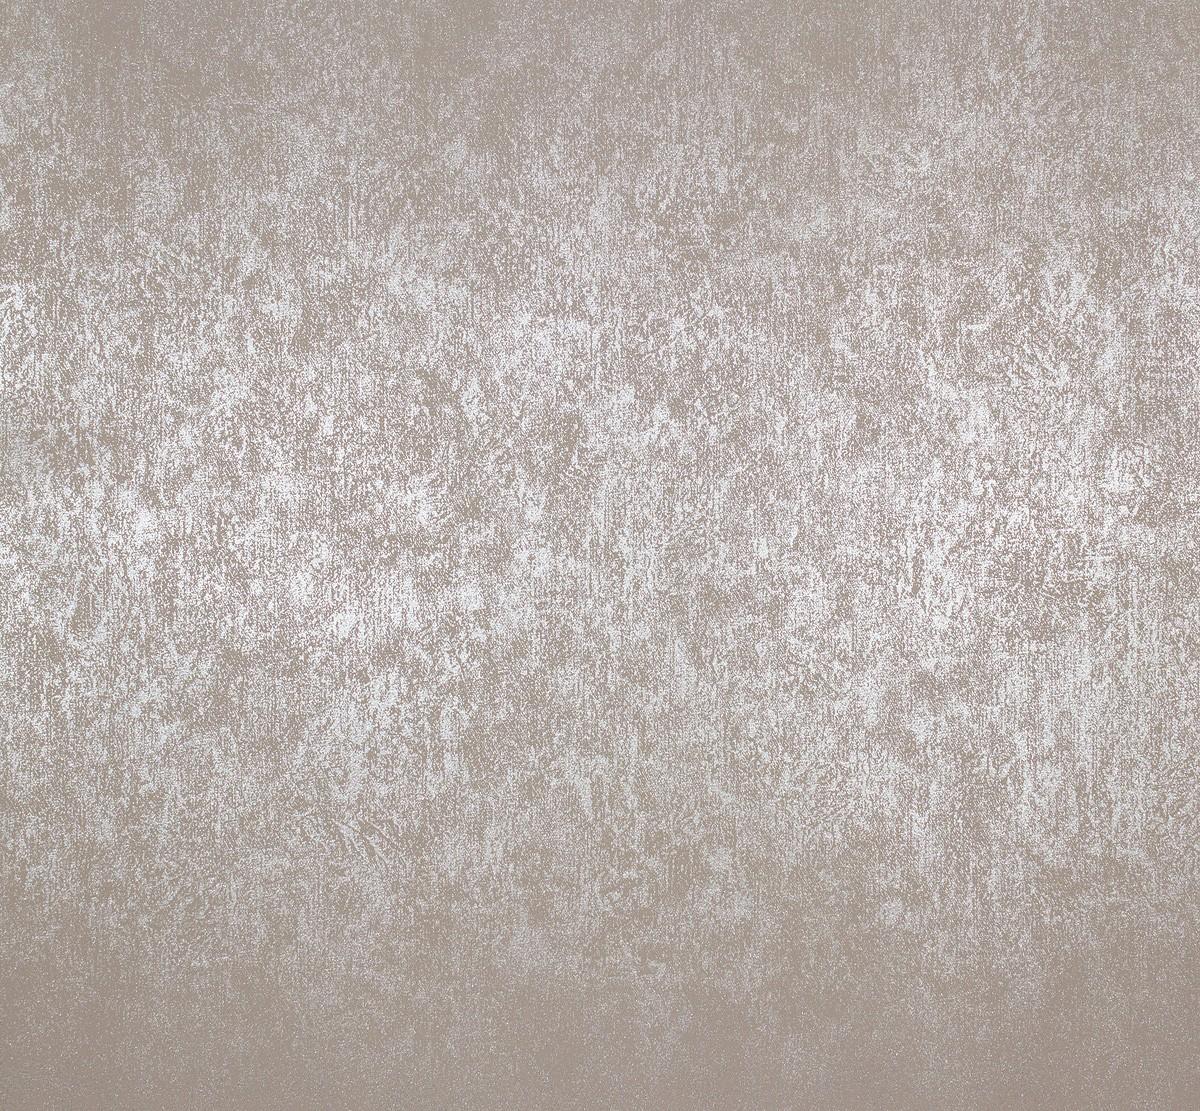 Vliestapete Uni Taupe Grau Metallic Tapete Marburg 55709